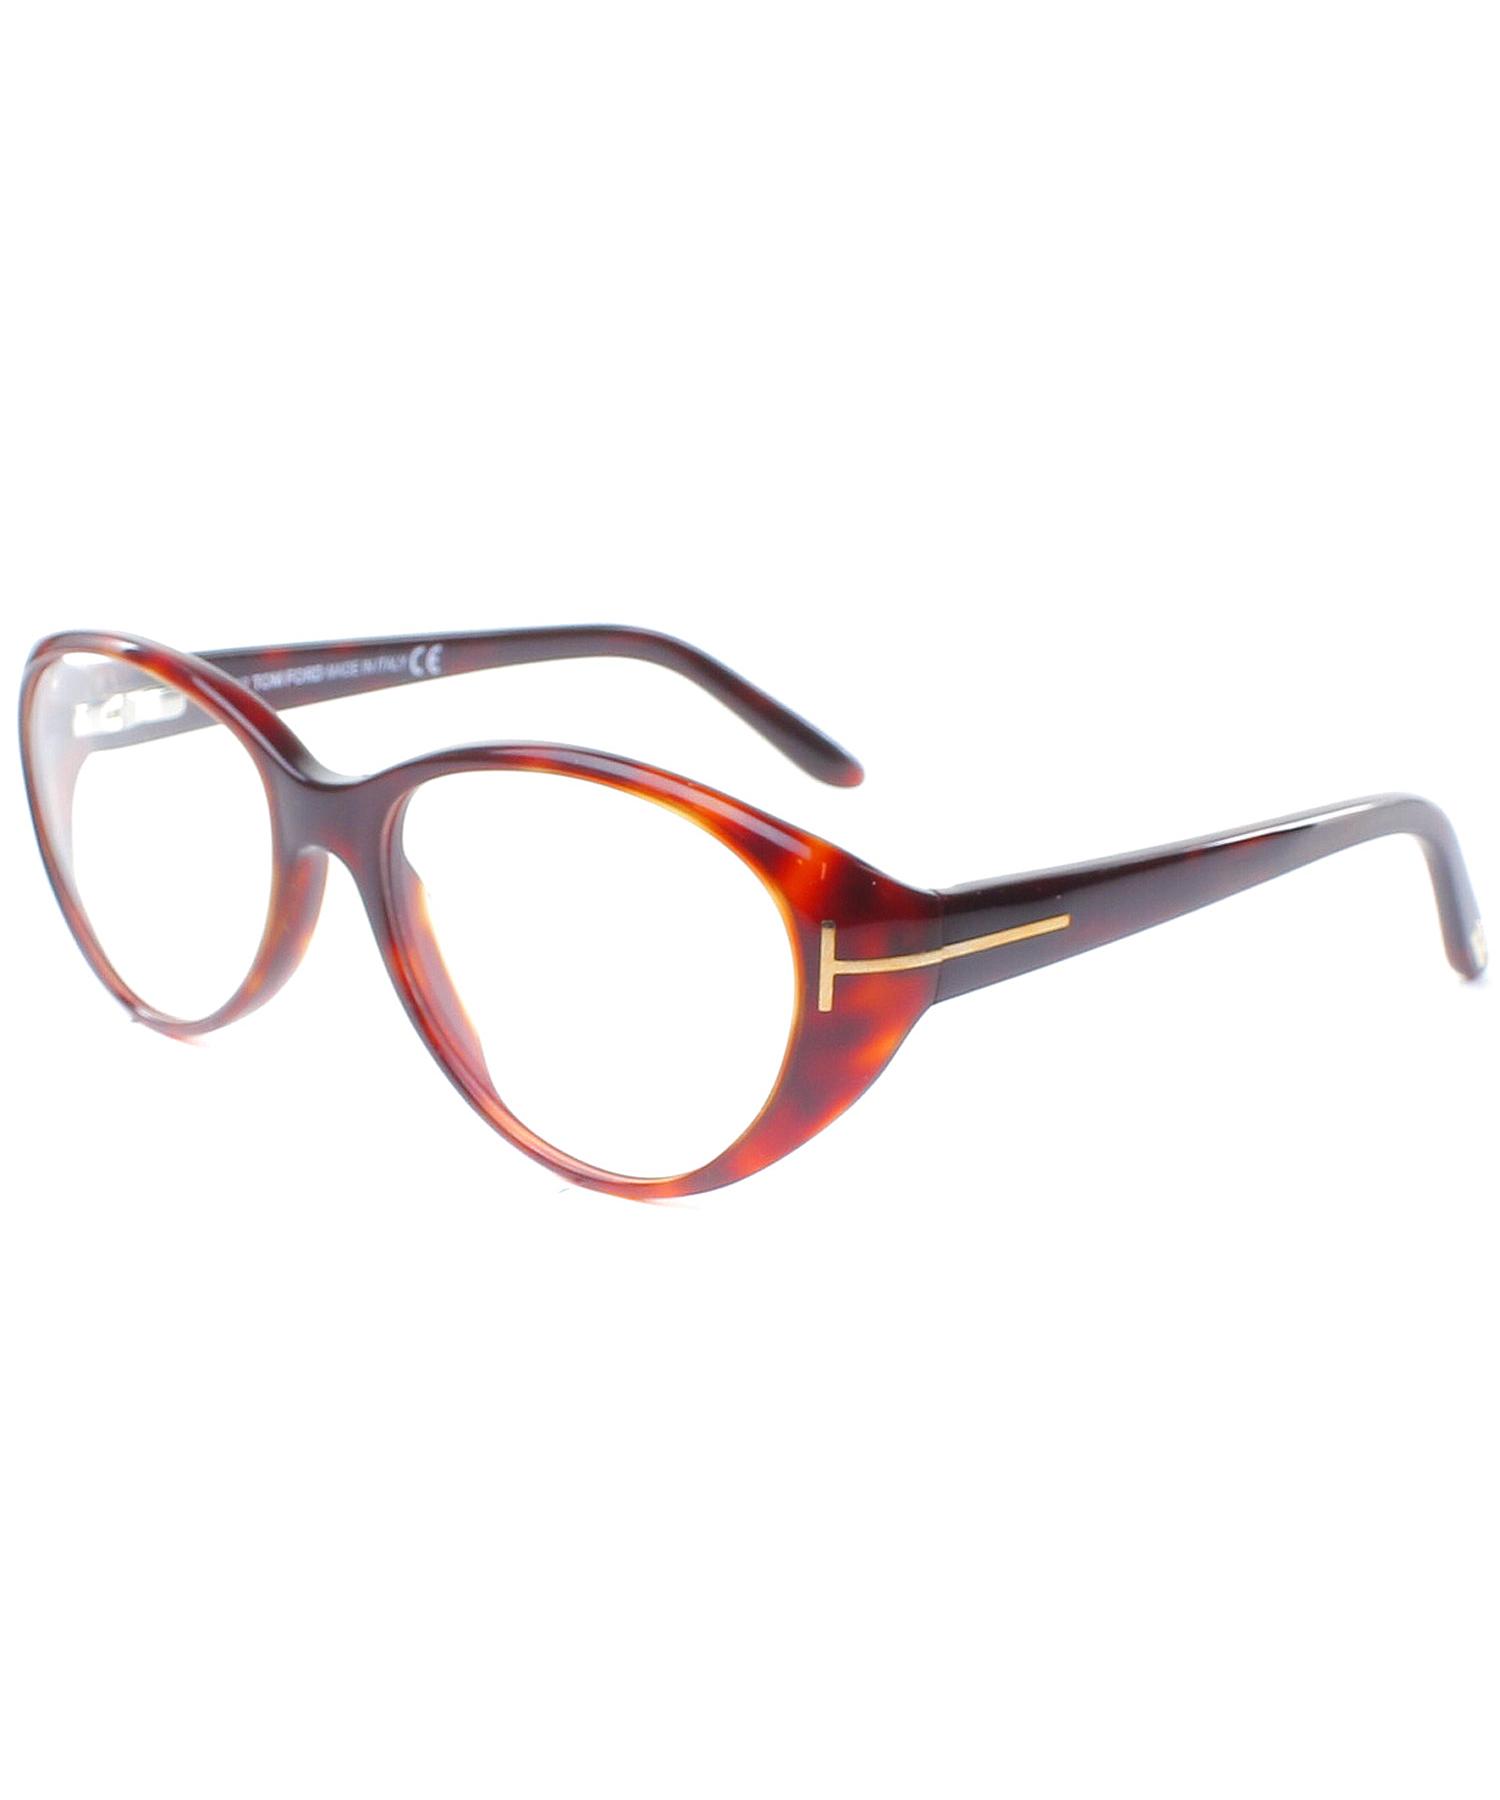 Tom ford Cat-eye Plastic Eyeglasses in Red Lyst